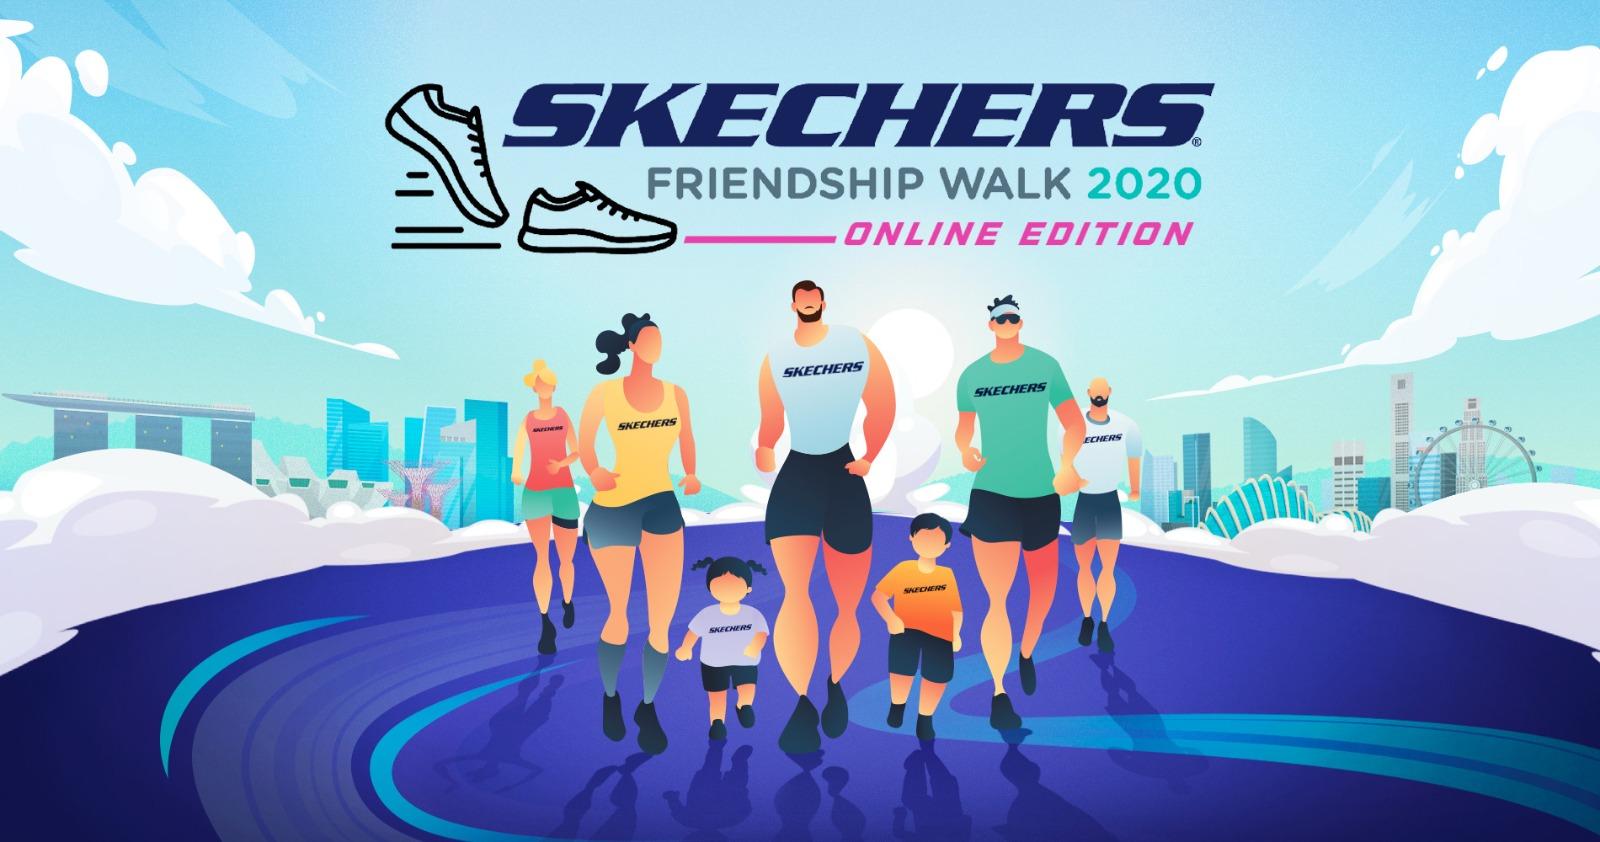 Logo of Skechers Friendship Walk 2020 Online Edition